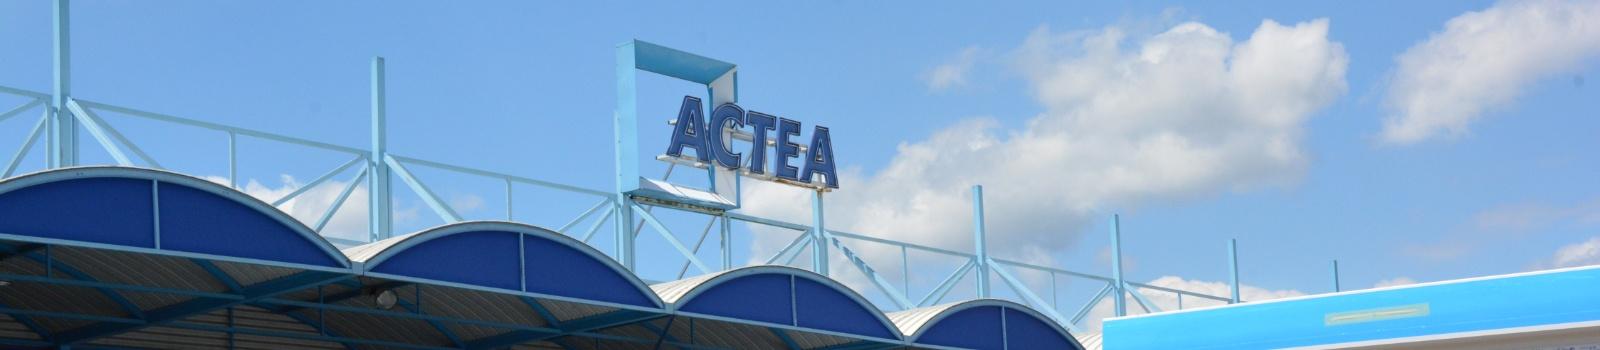 Les actualités de ACTEA